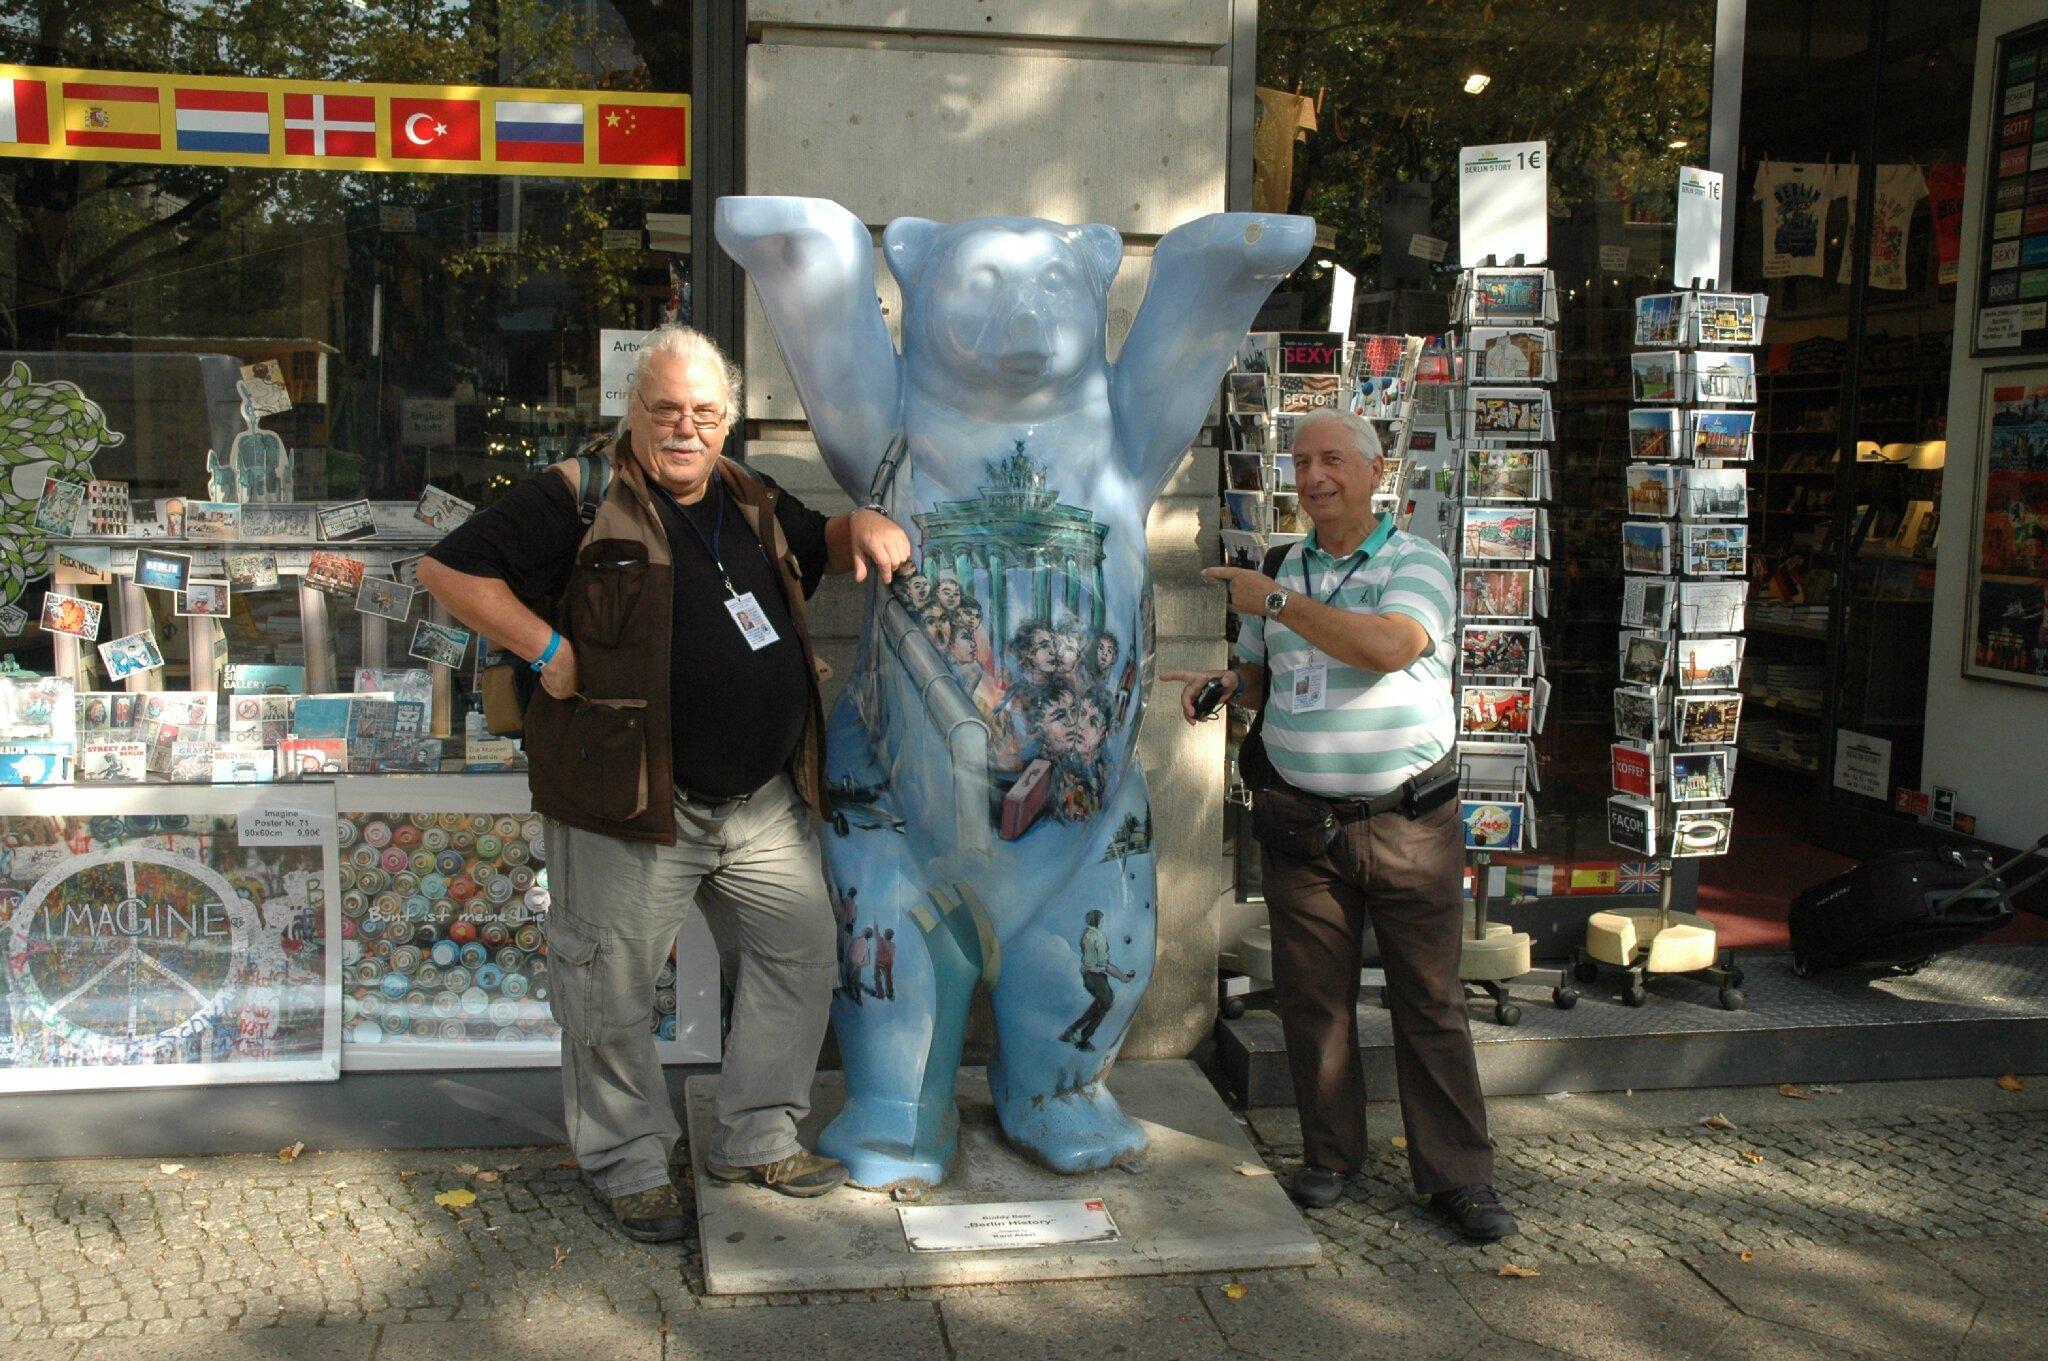 095 Unter den Linden Jacques & Gilles (2)